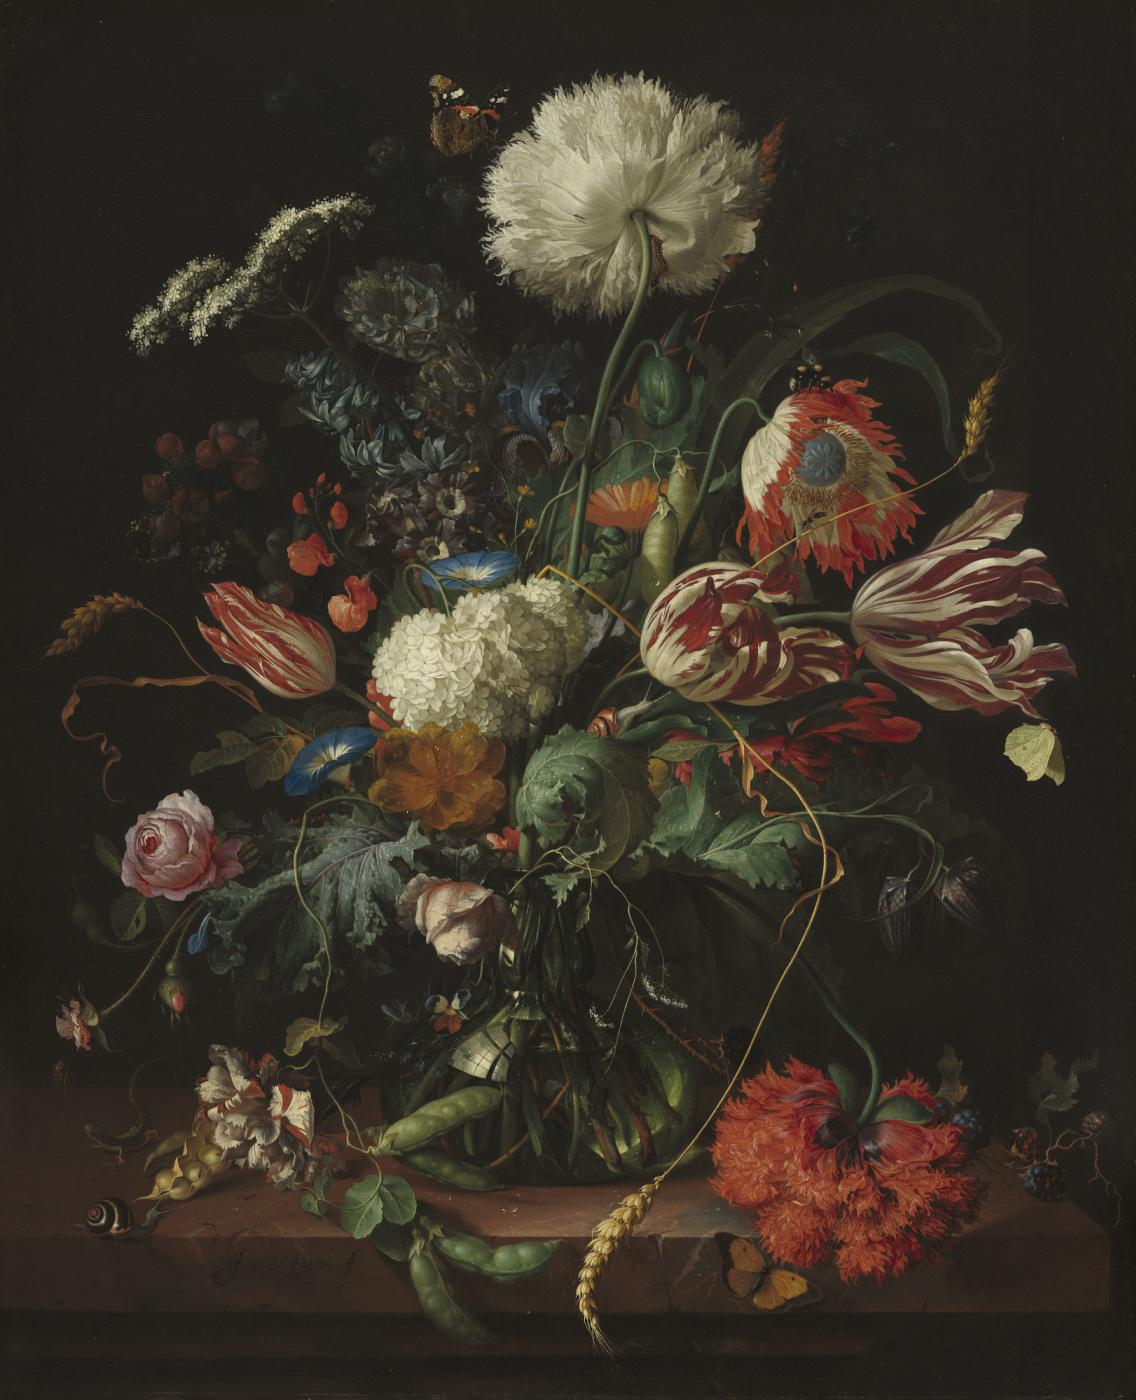 Jan Davids de Hem. Vase with flowers